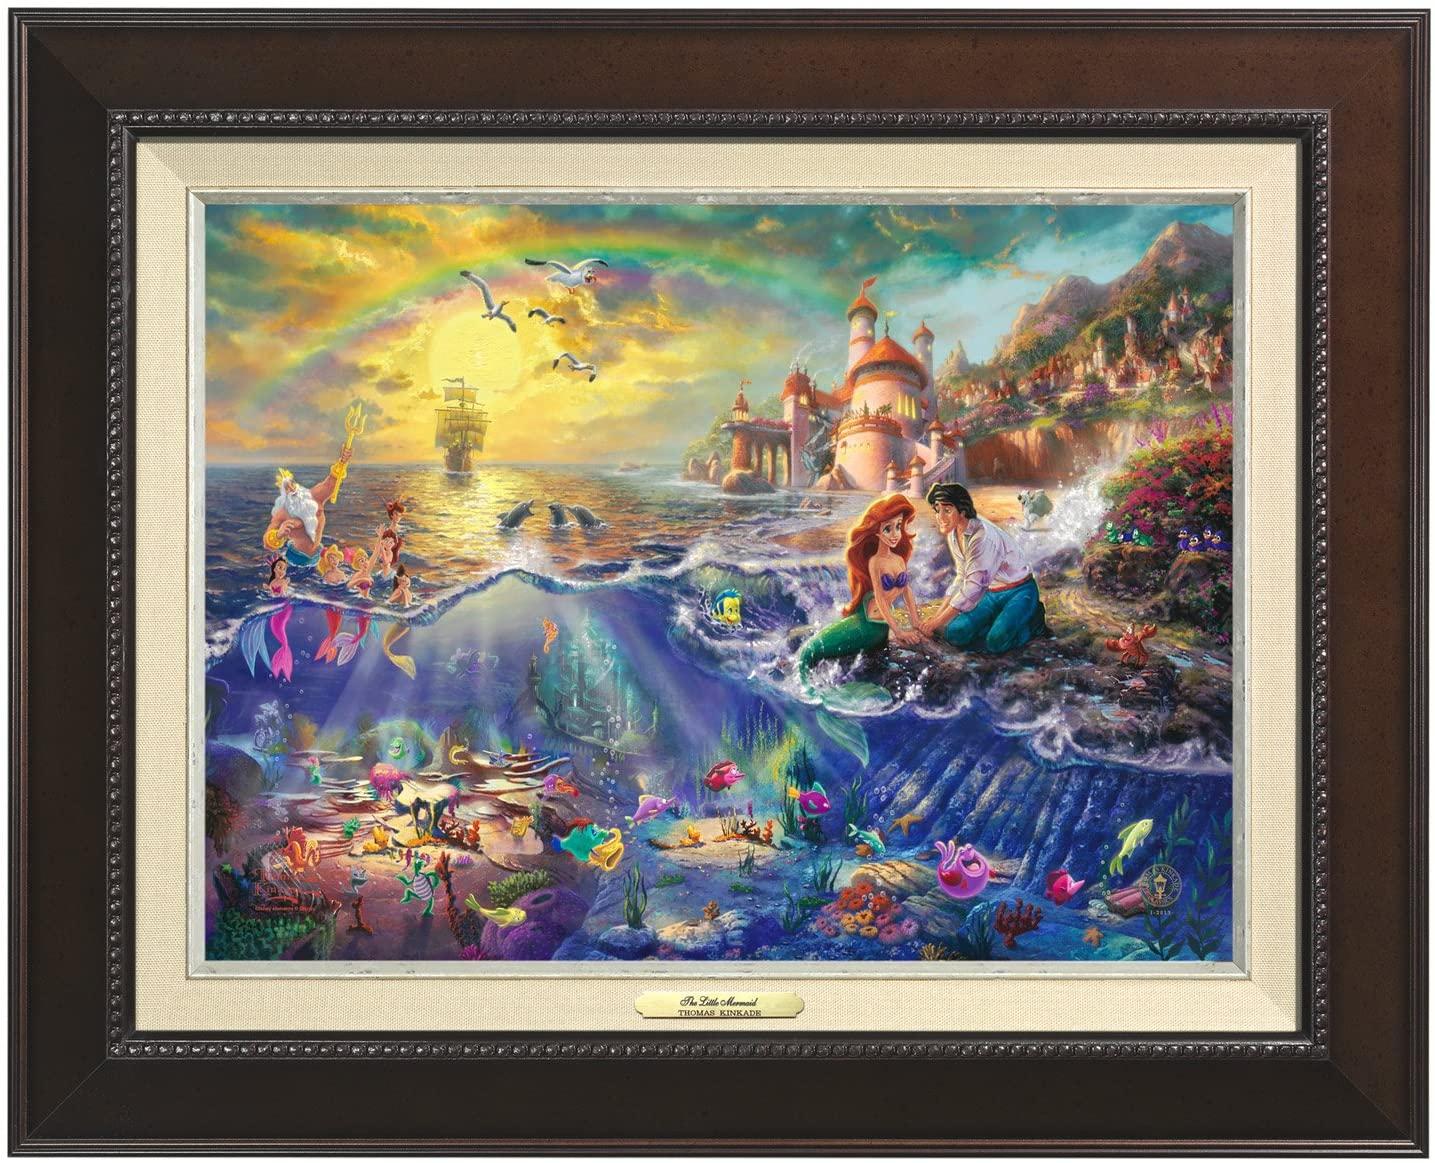 Thomas Kinkade Canvas Classic Little Mermaid - 12 x 16 - Espresso Frame - 60994